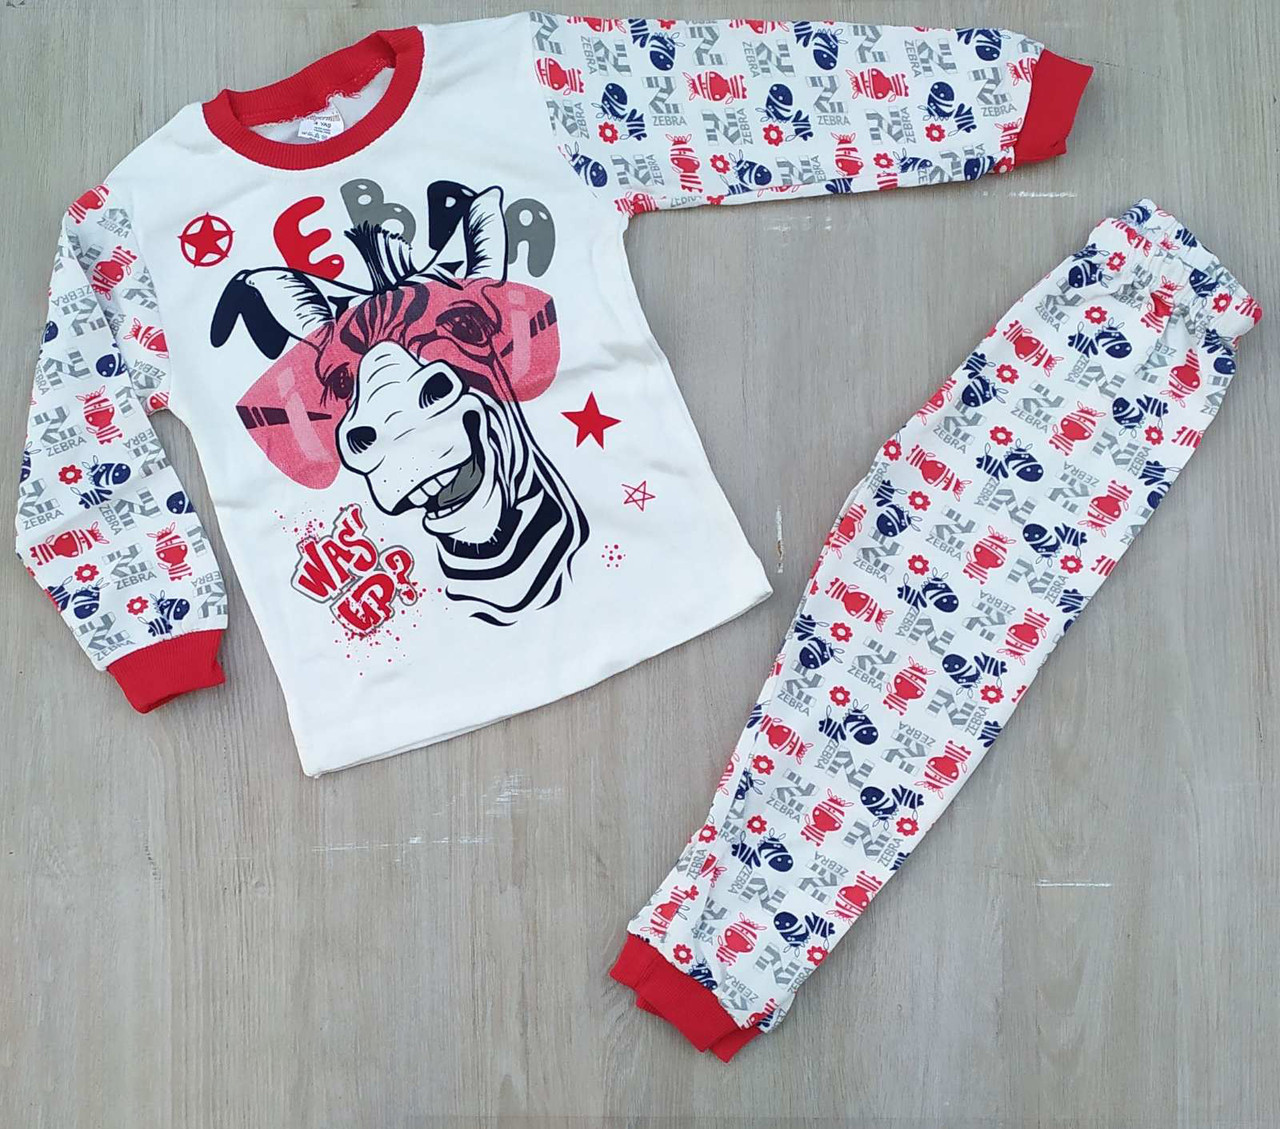 "Пижама - двойка на девочку (4-6 лет) ""Kapitoshka"" LM-749"